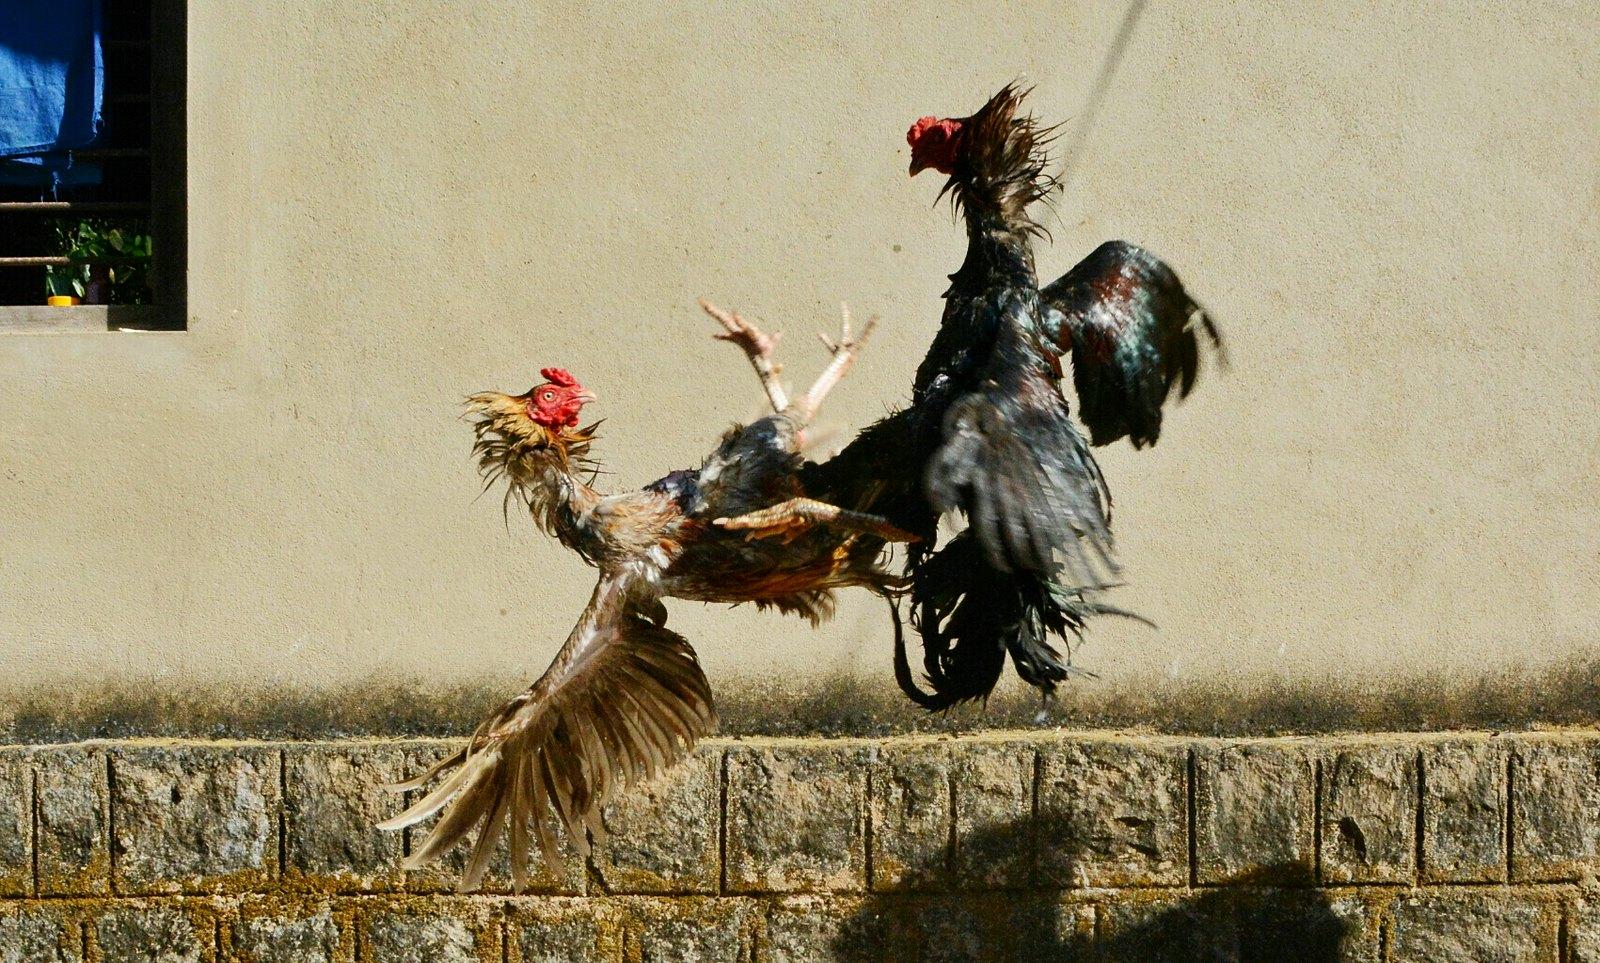 Macam-macam Trik Menang Sabung Ayam Online